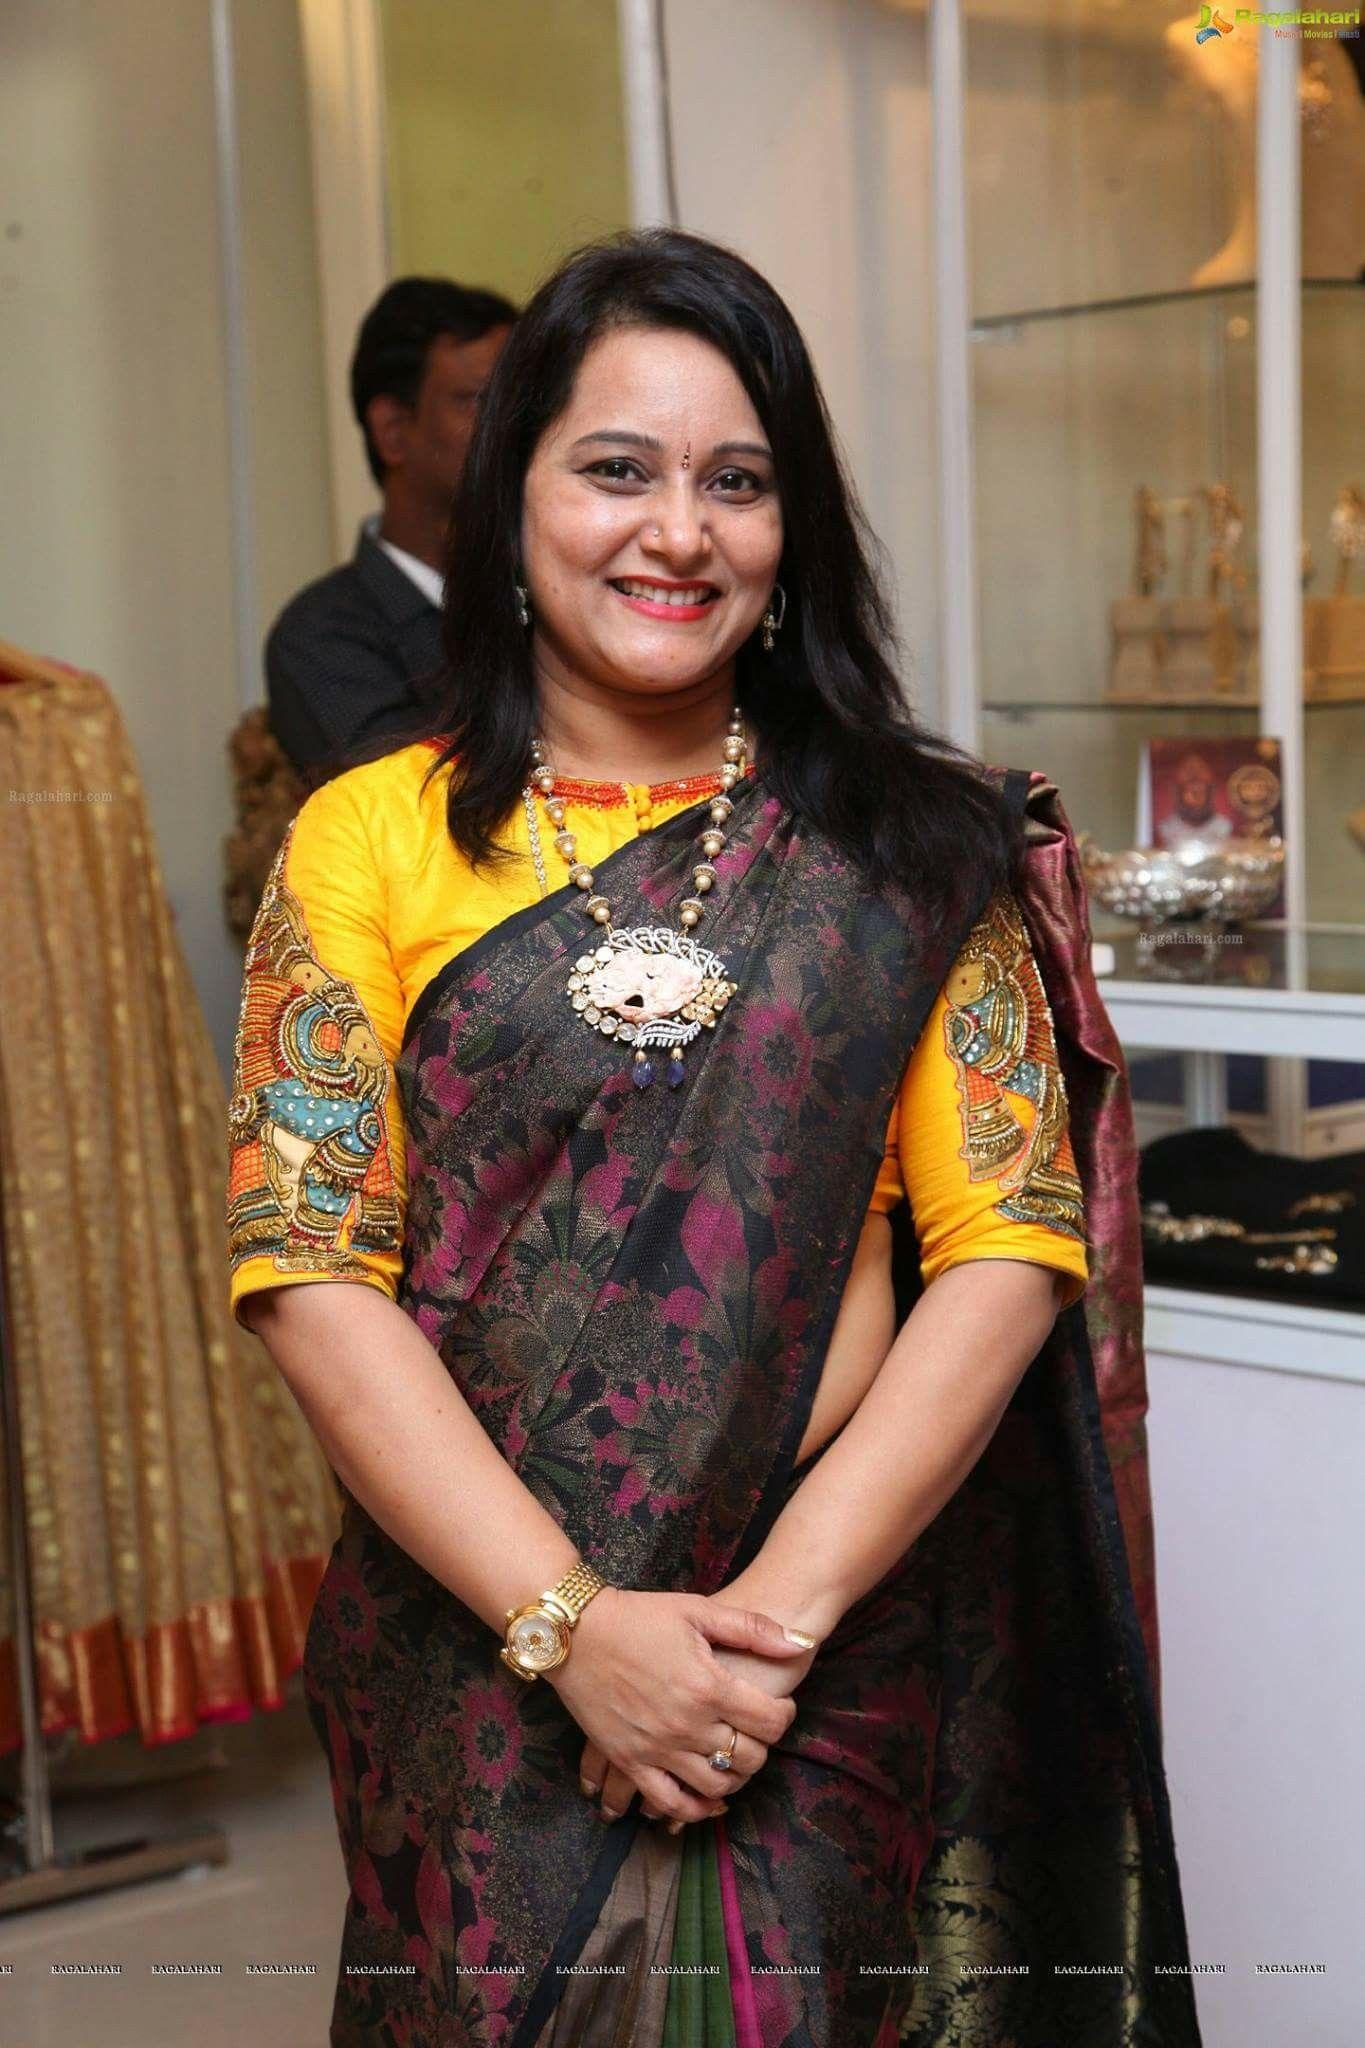 Saree blouse design new pin by poonam joshi on saree  pinterest  saree blouse designs and